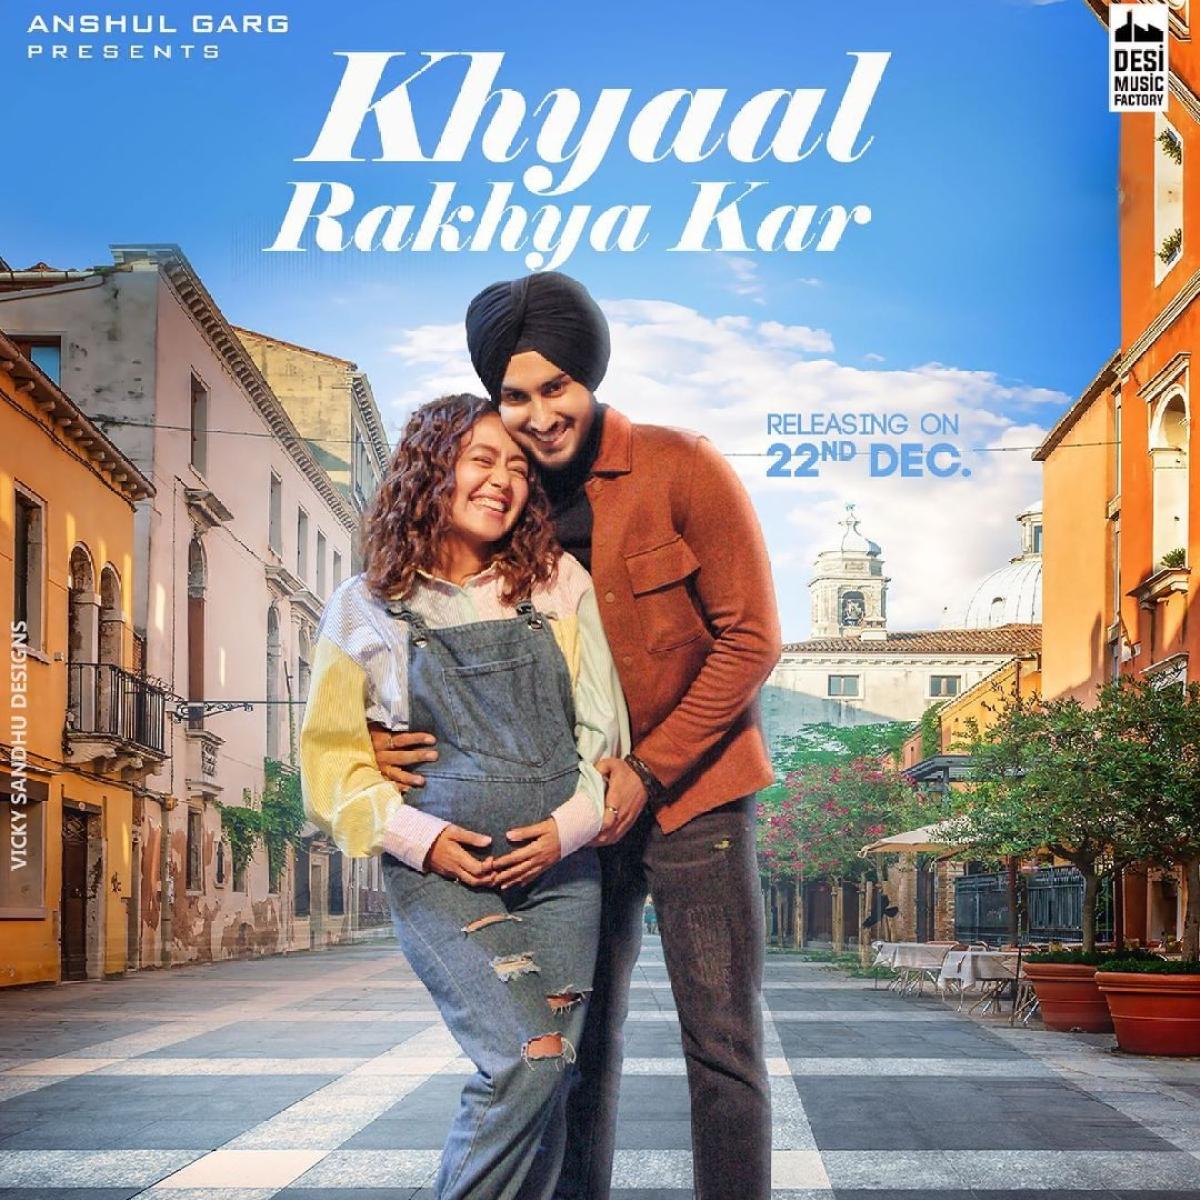 'Wait the pregnancy was staged': Twitterati react to Neha Kakkar and Rohanpreet Singh's 'Khyaal Rakhya Kar'